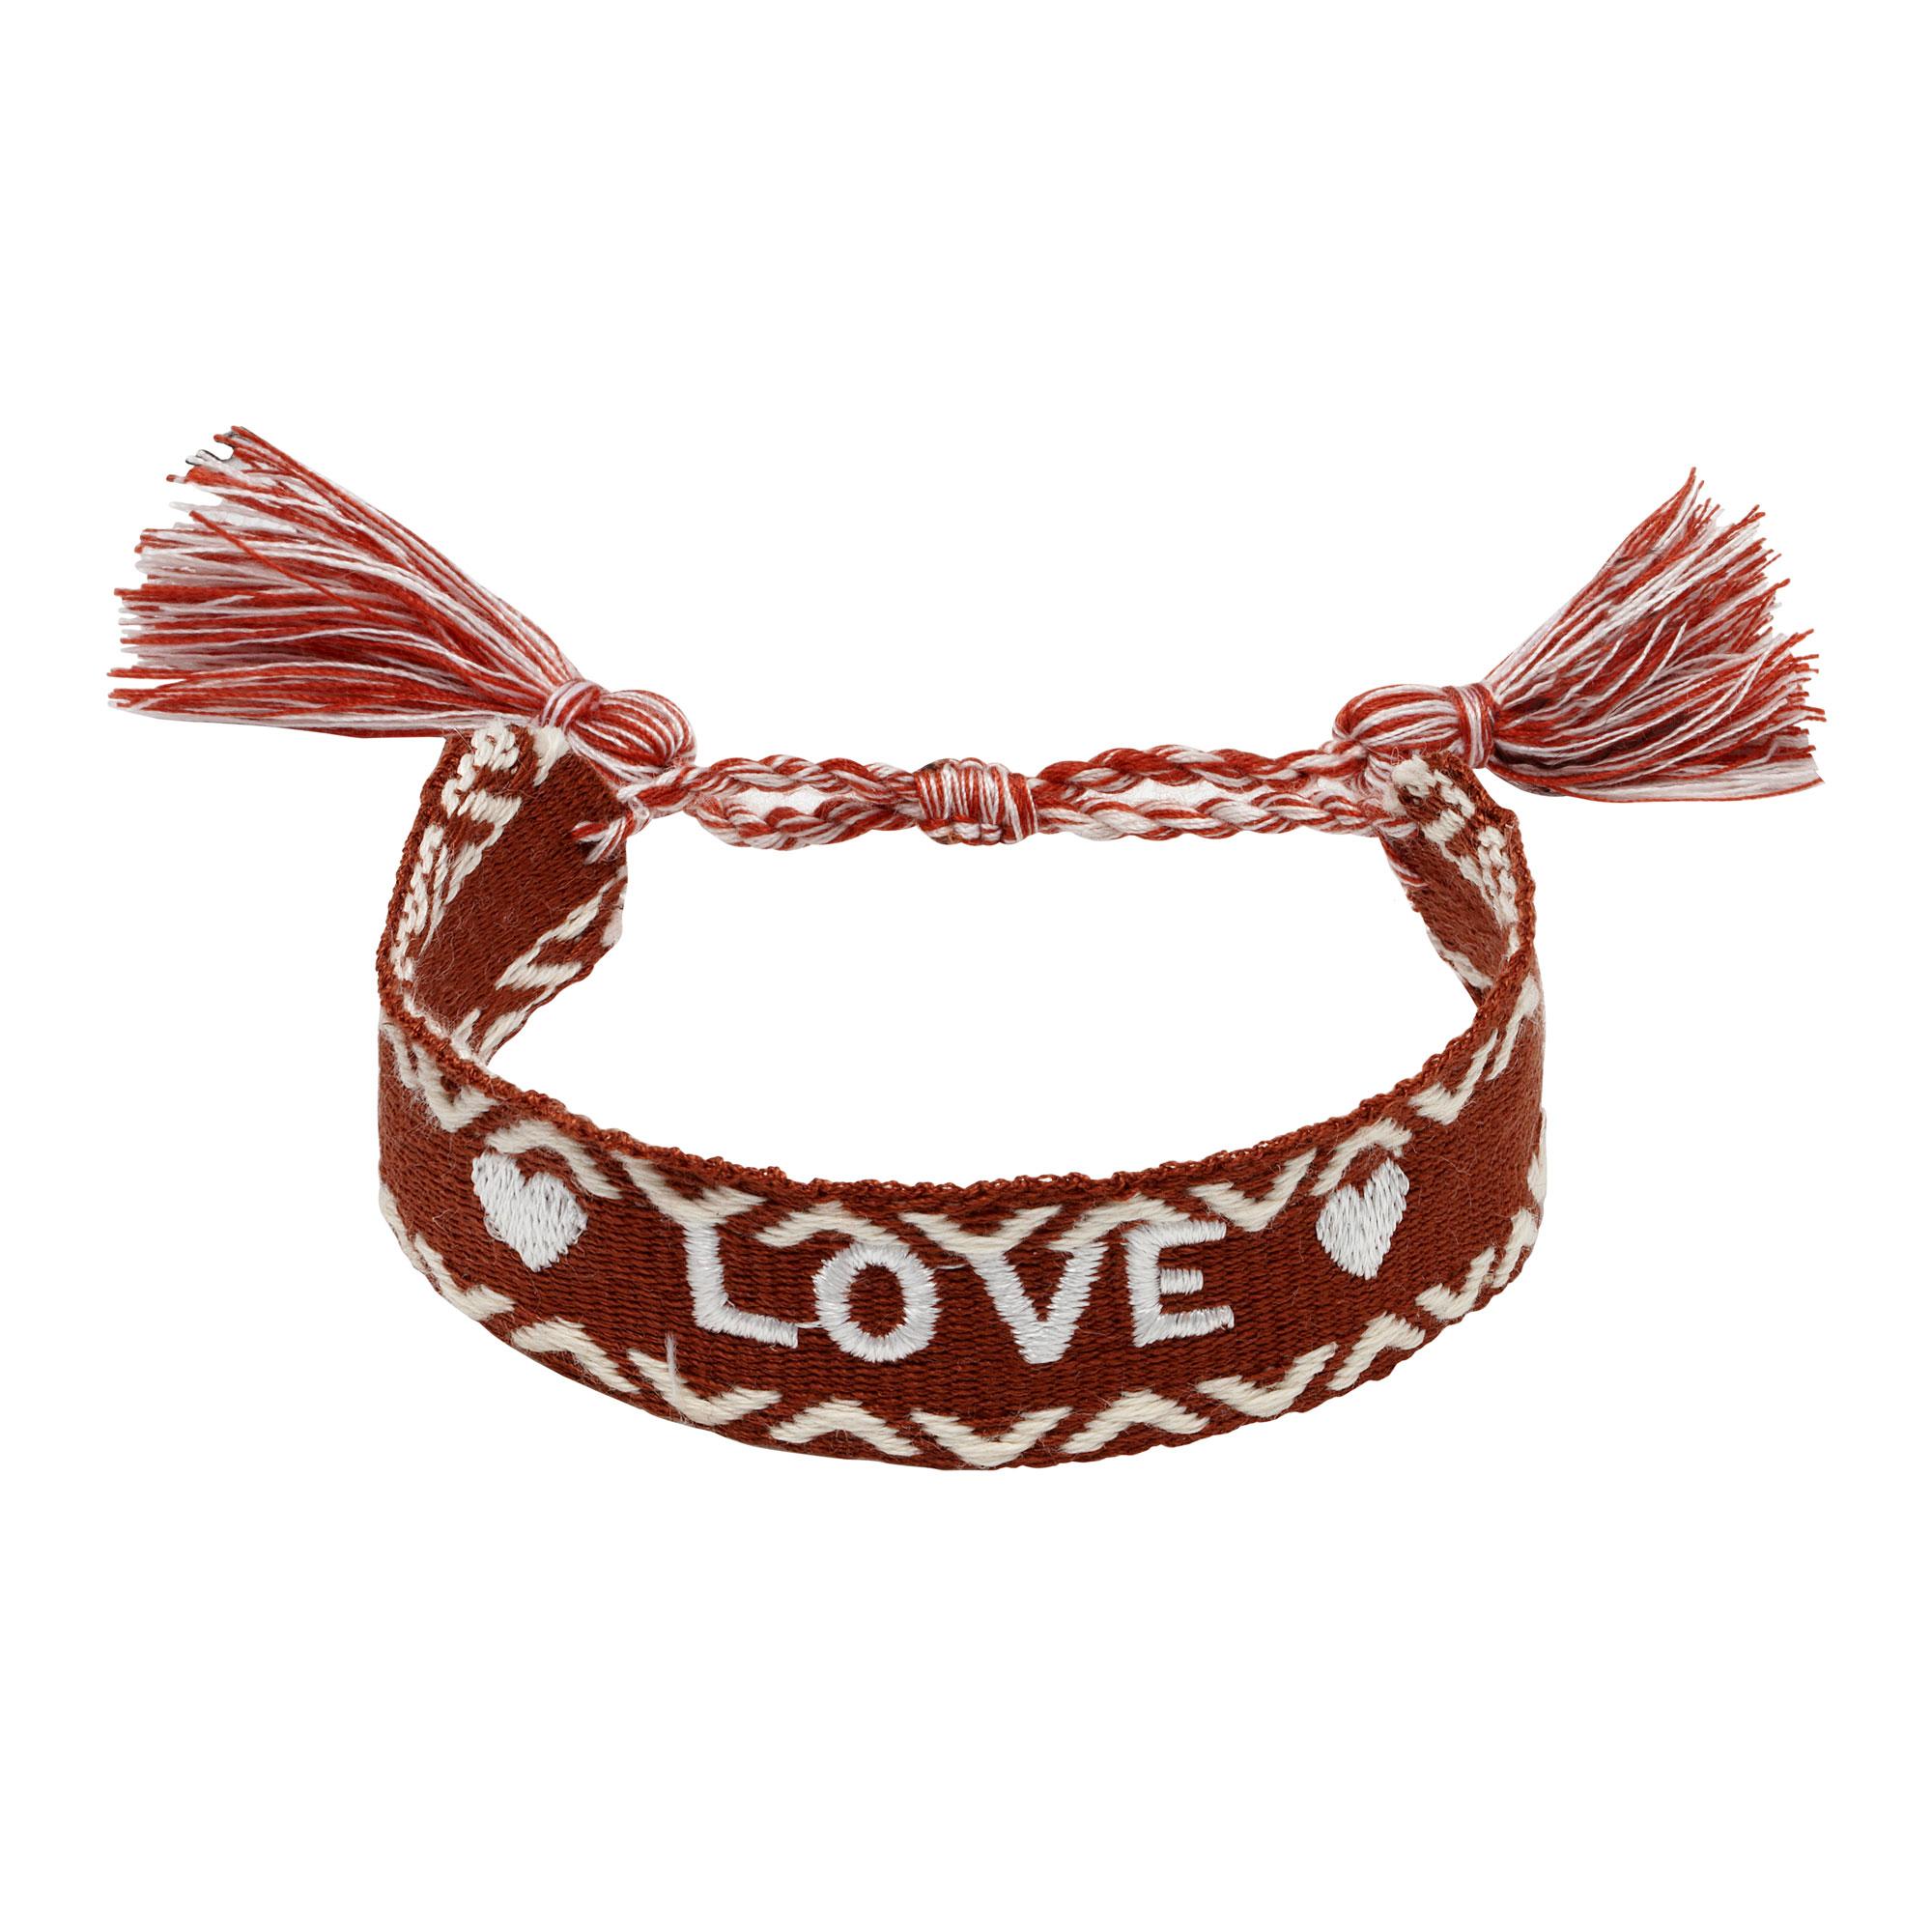 Armband woven love